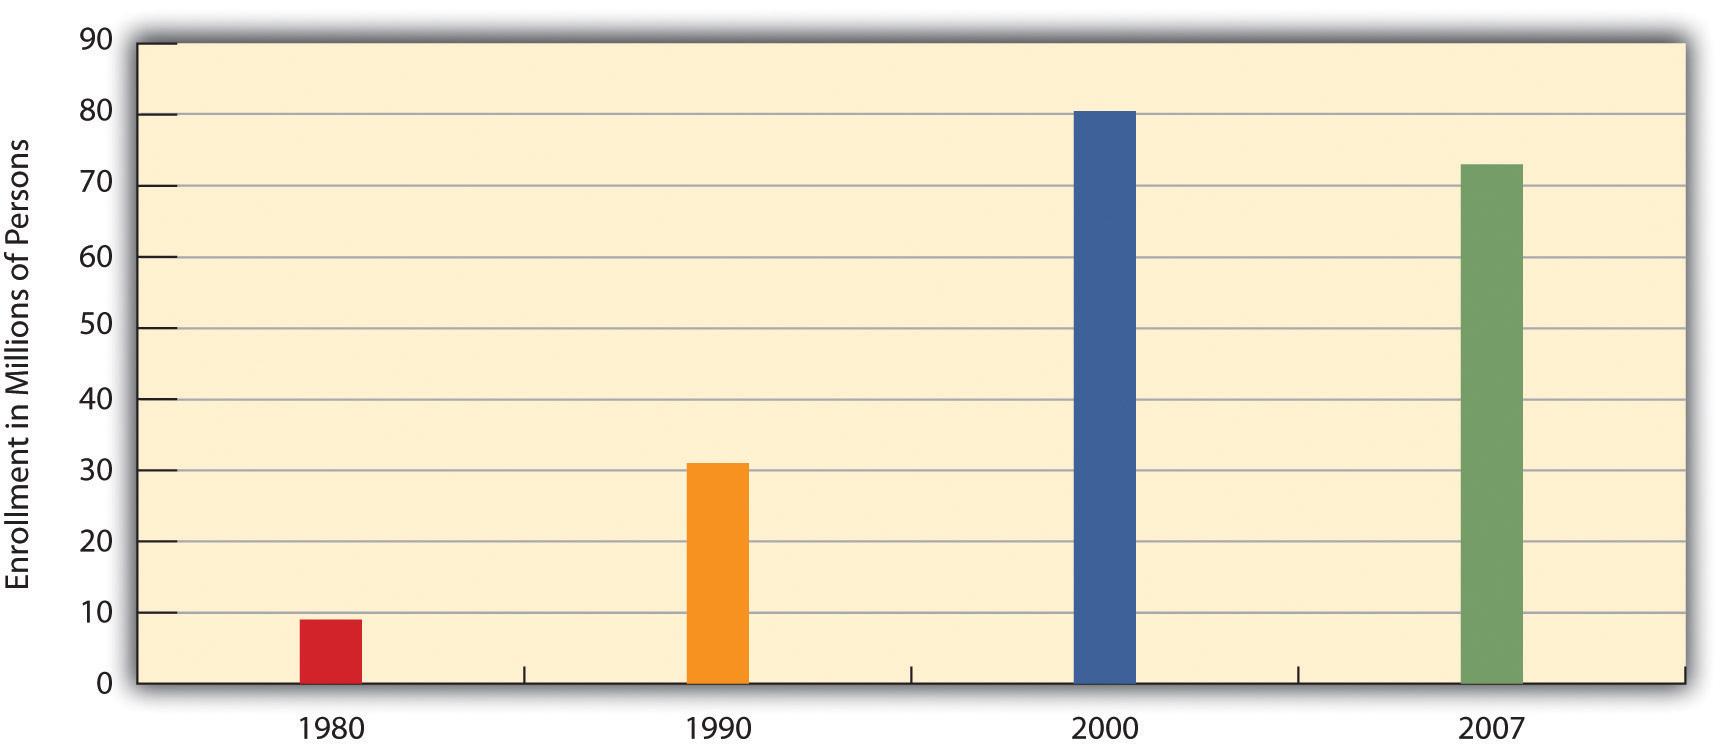 Growth of Health Maintenance Organizations (HMOs), 1980-2007 (Millions of Enrollees)